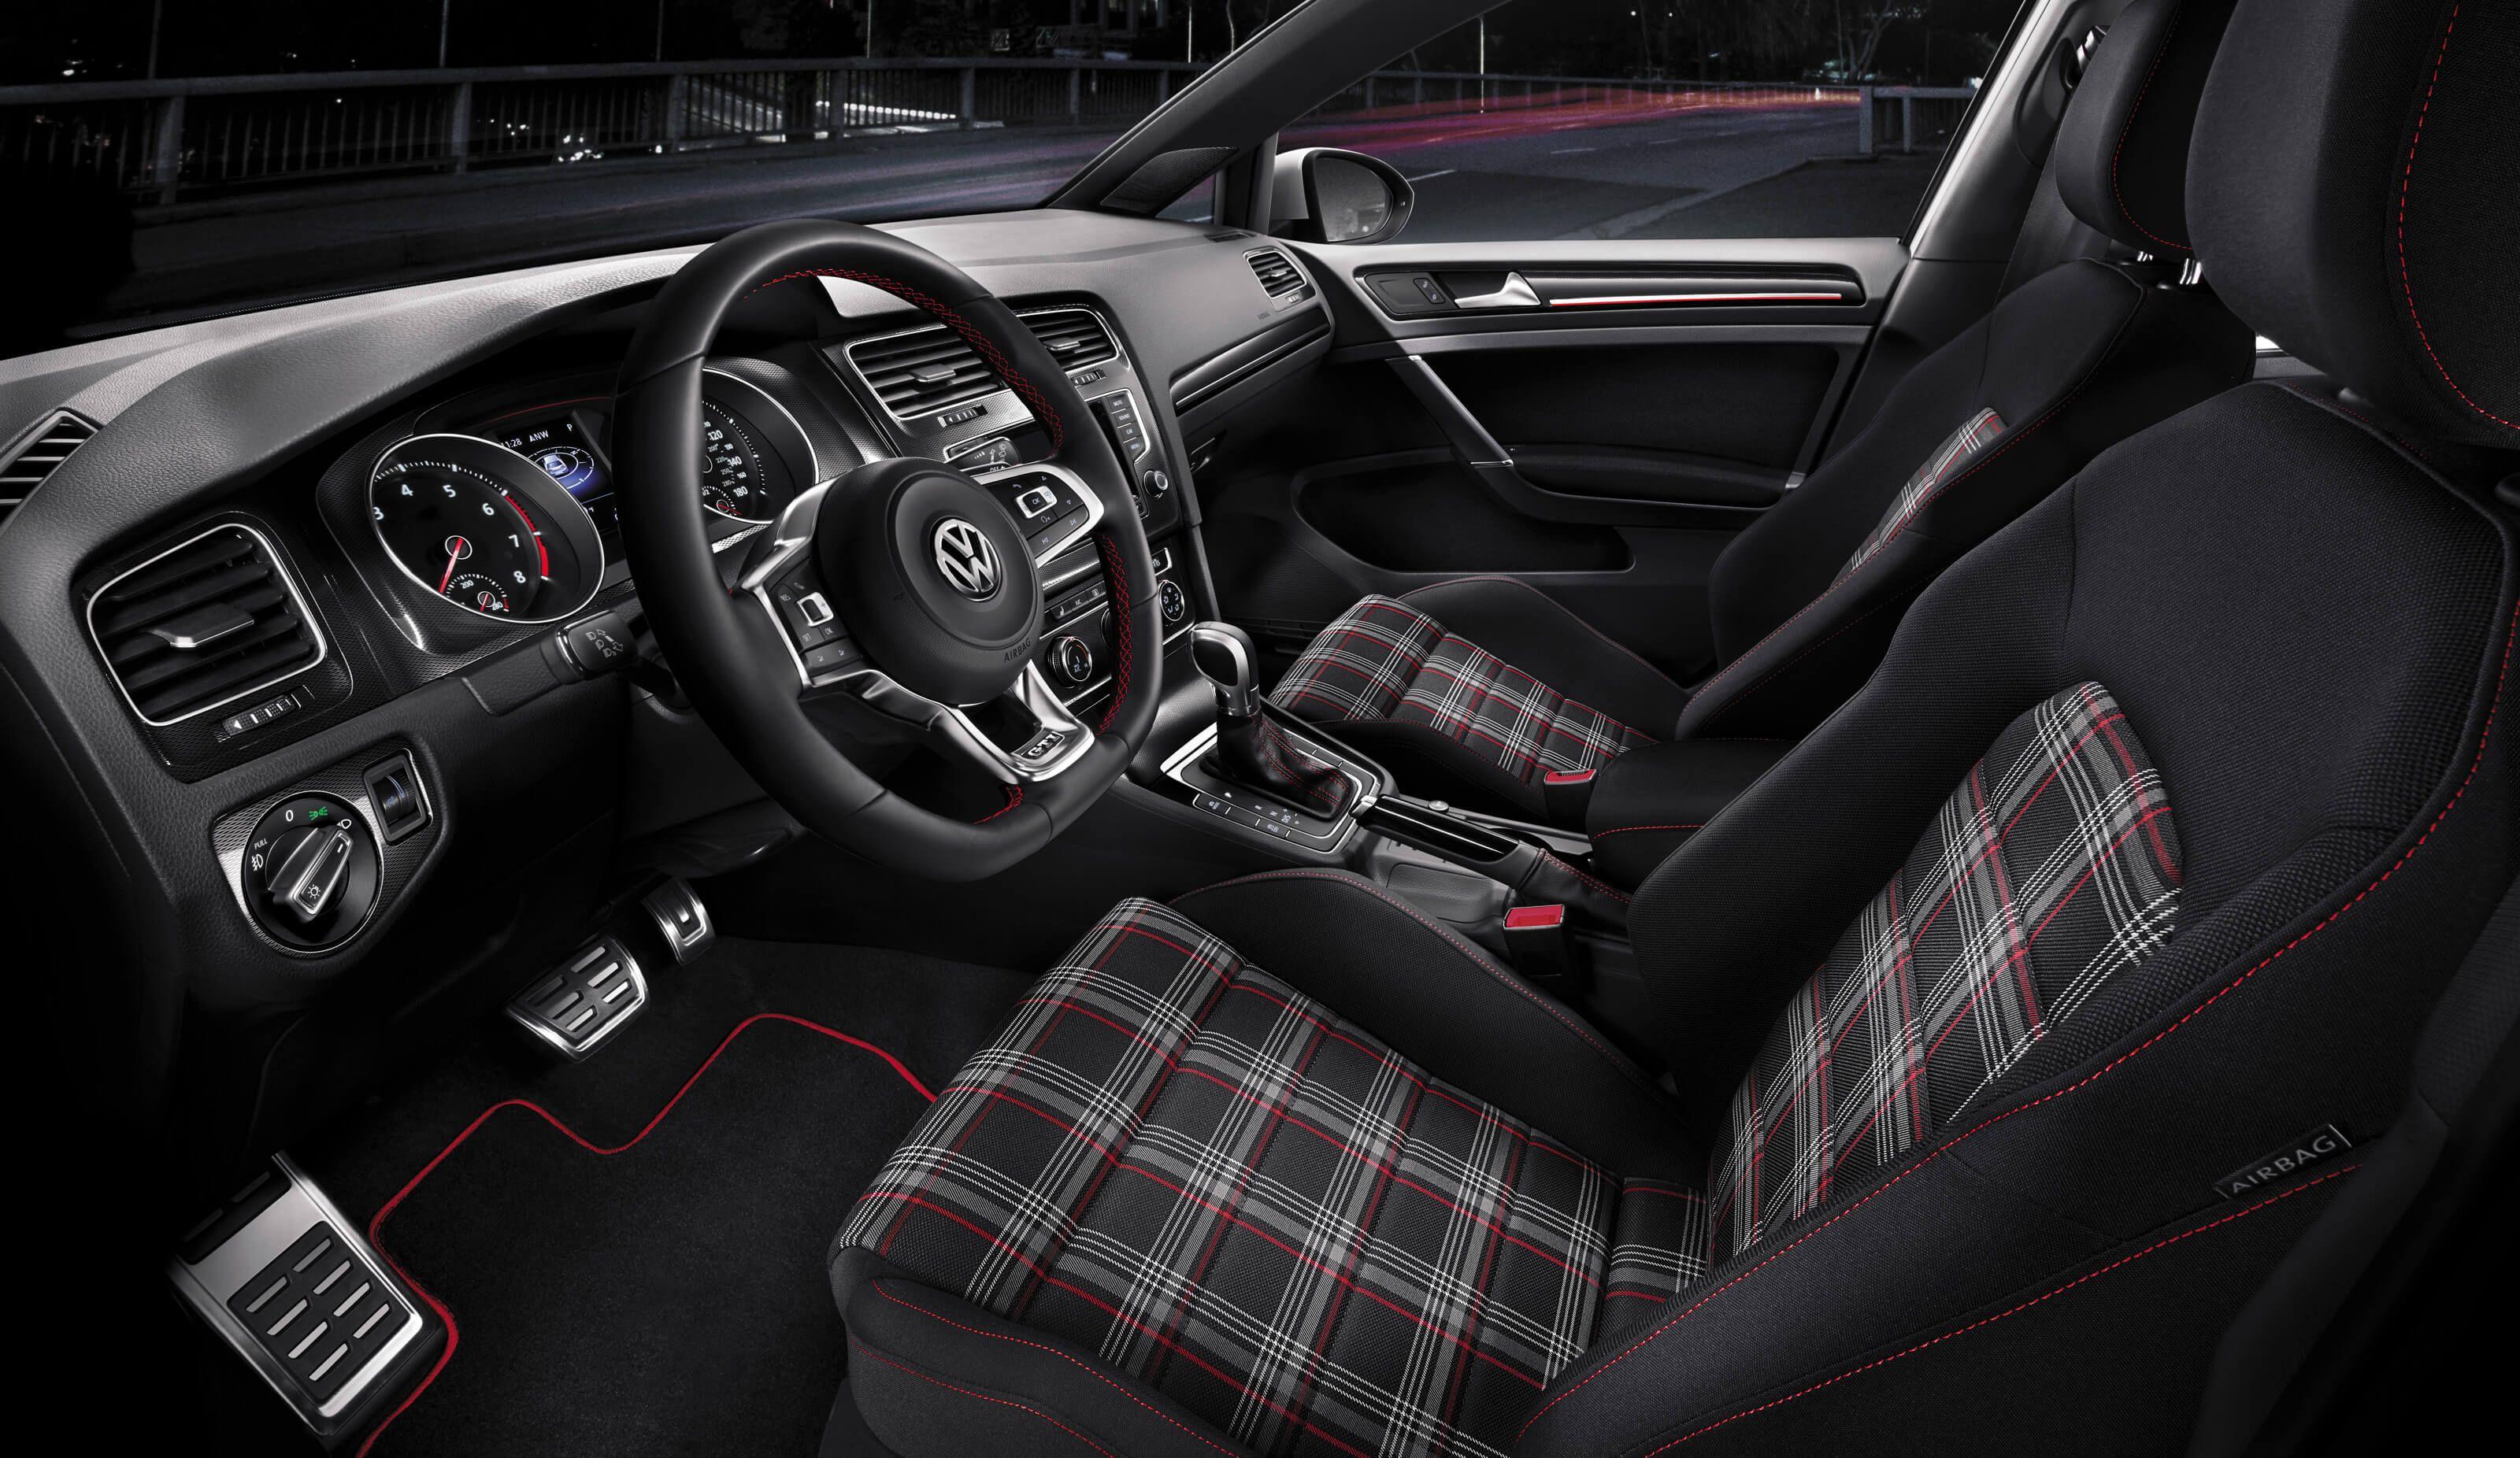 2017 VW Golf GTI - Performance Hot Hatch | Volkswagen | Automobile ... | {Auto cockpit vw 35}